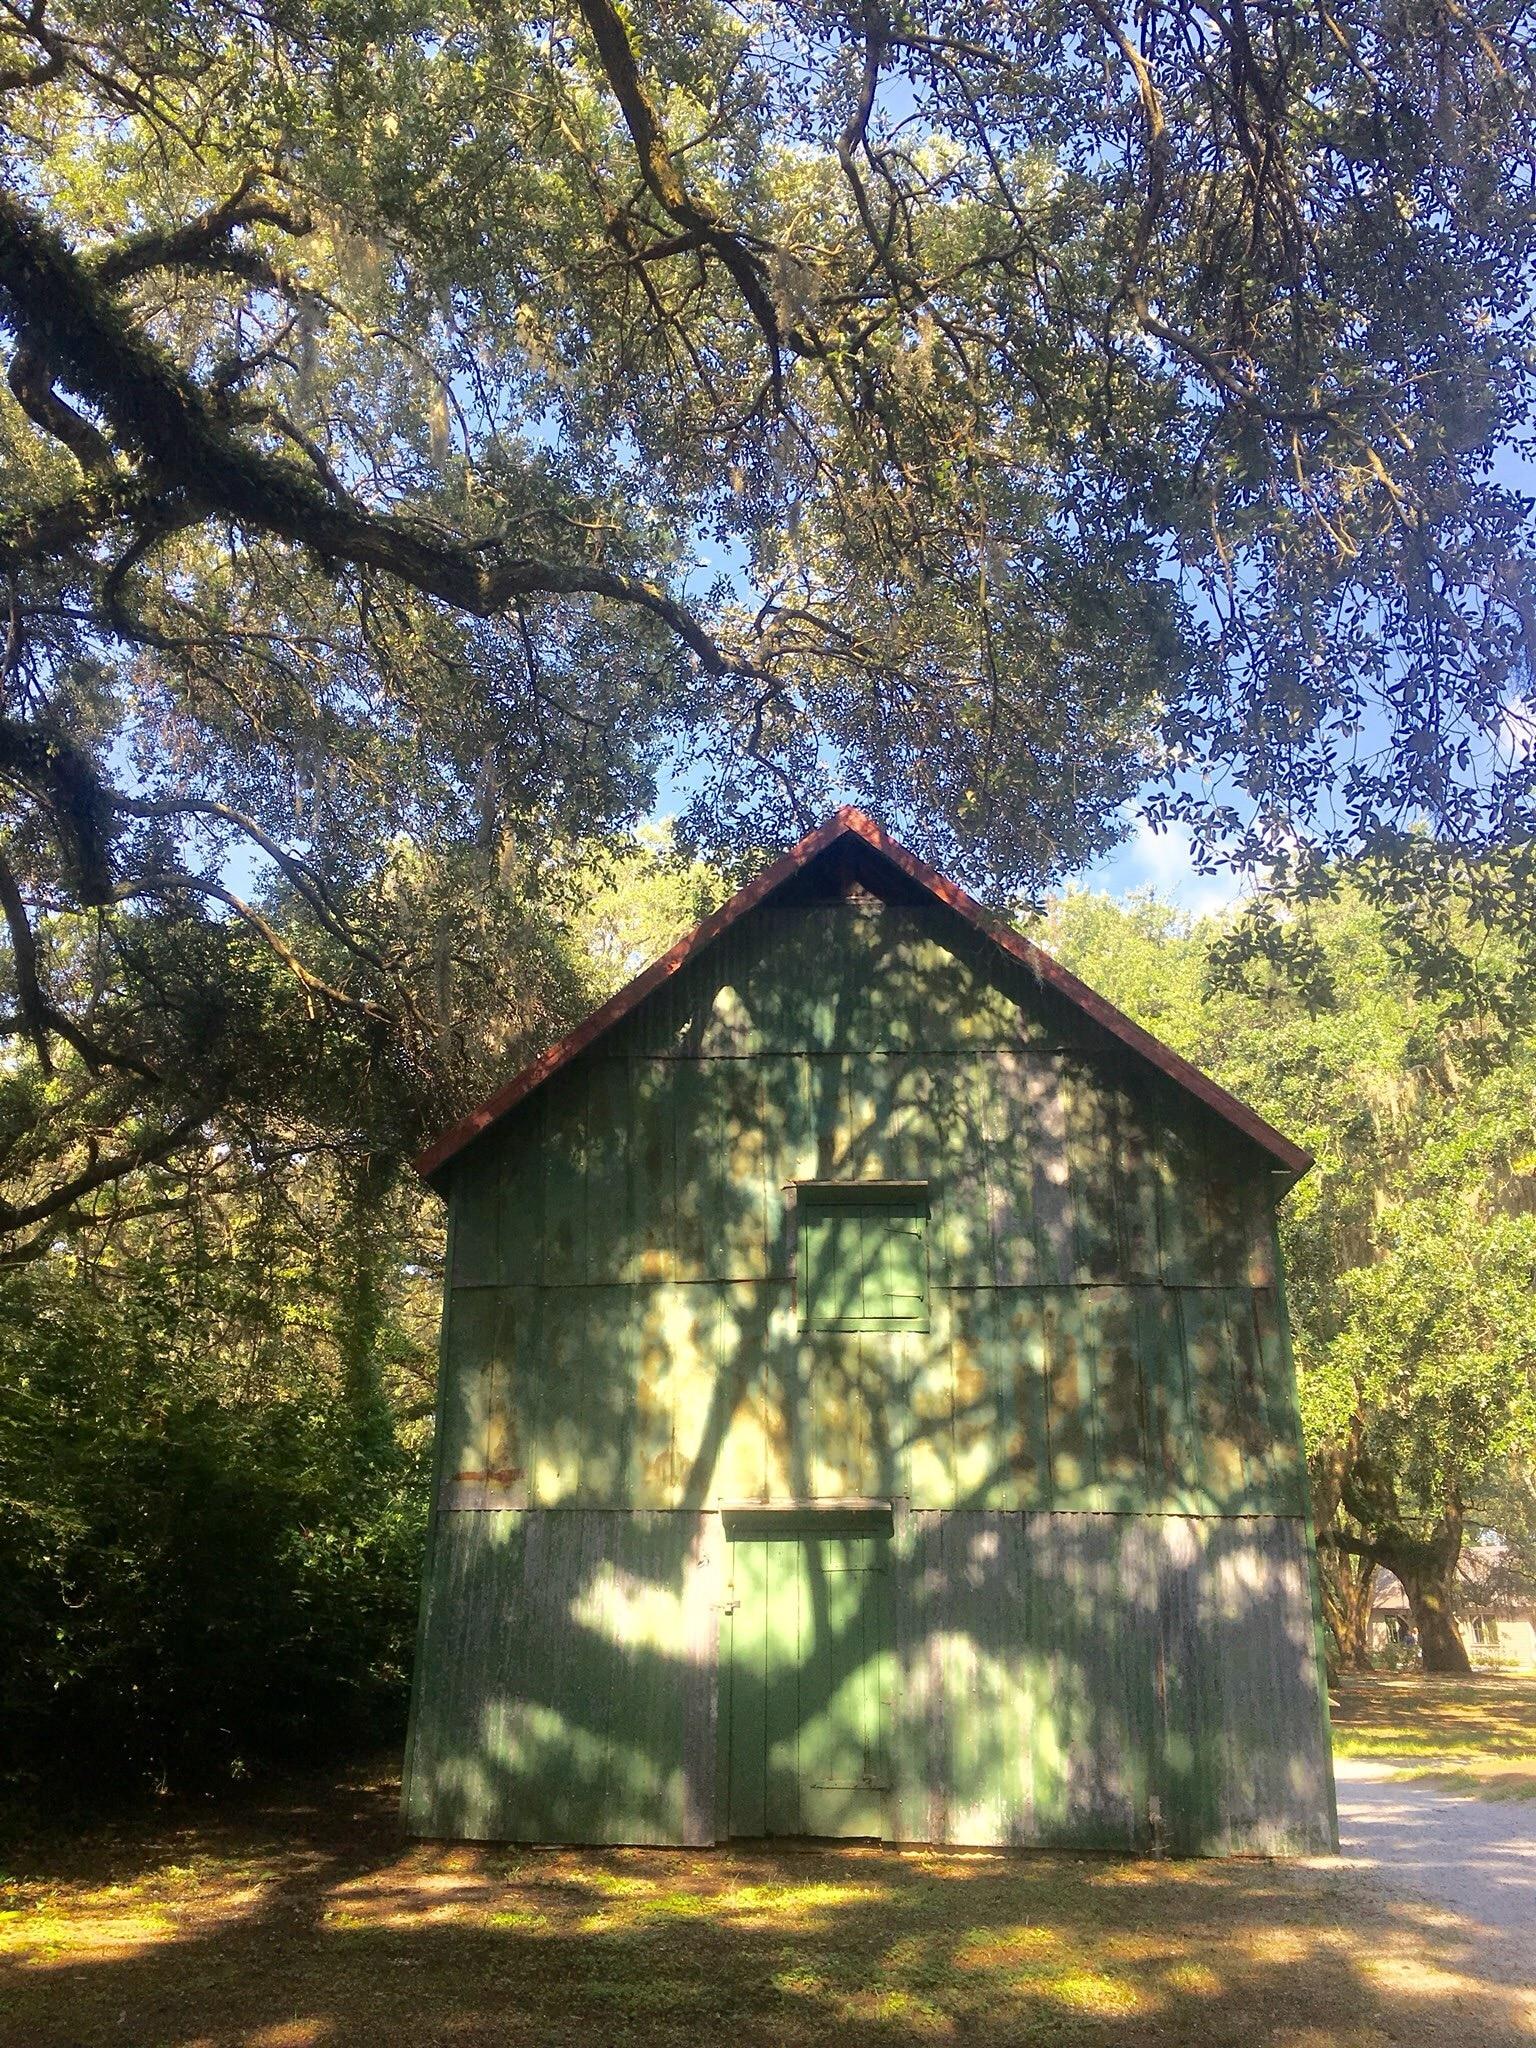 James Island, South Carolina, United States of America